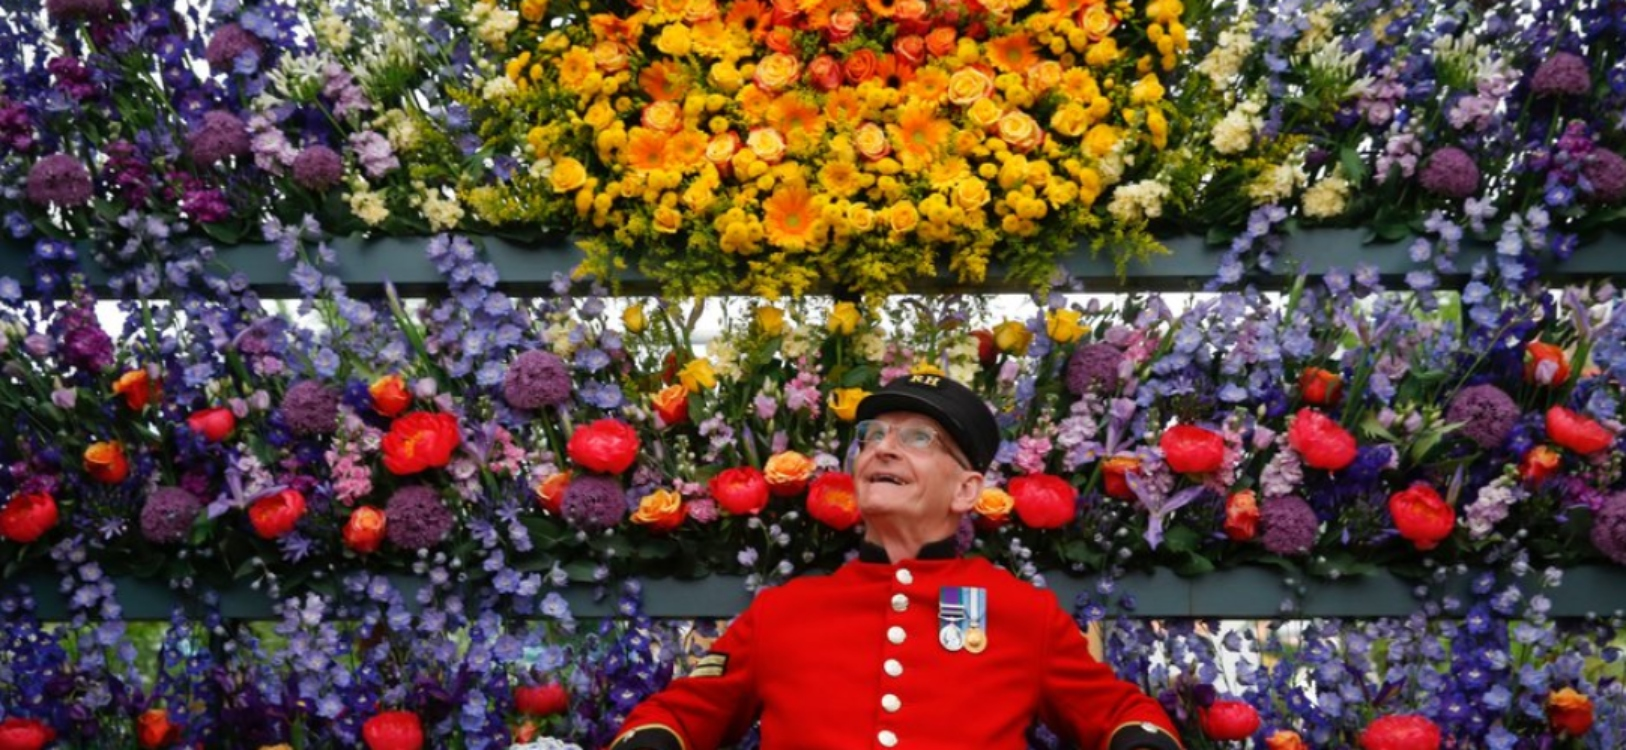 RHS Chelsea Flower Show 2021 Bulletin – De Tuinen